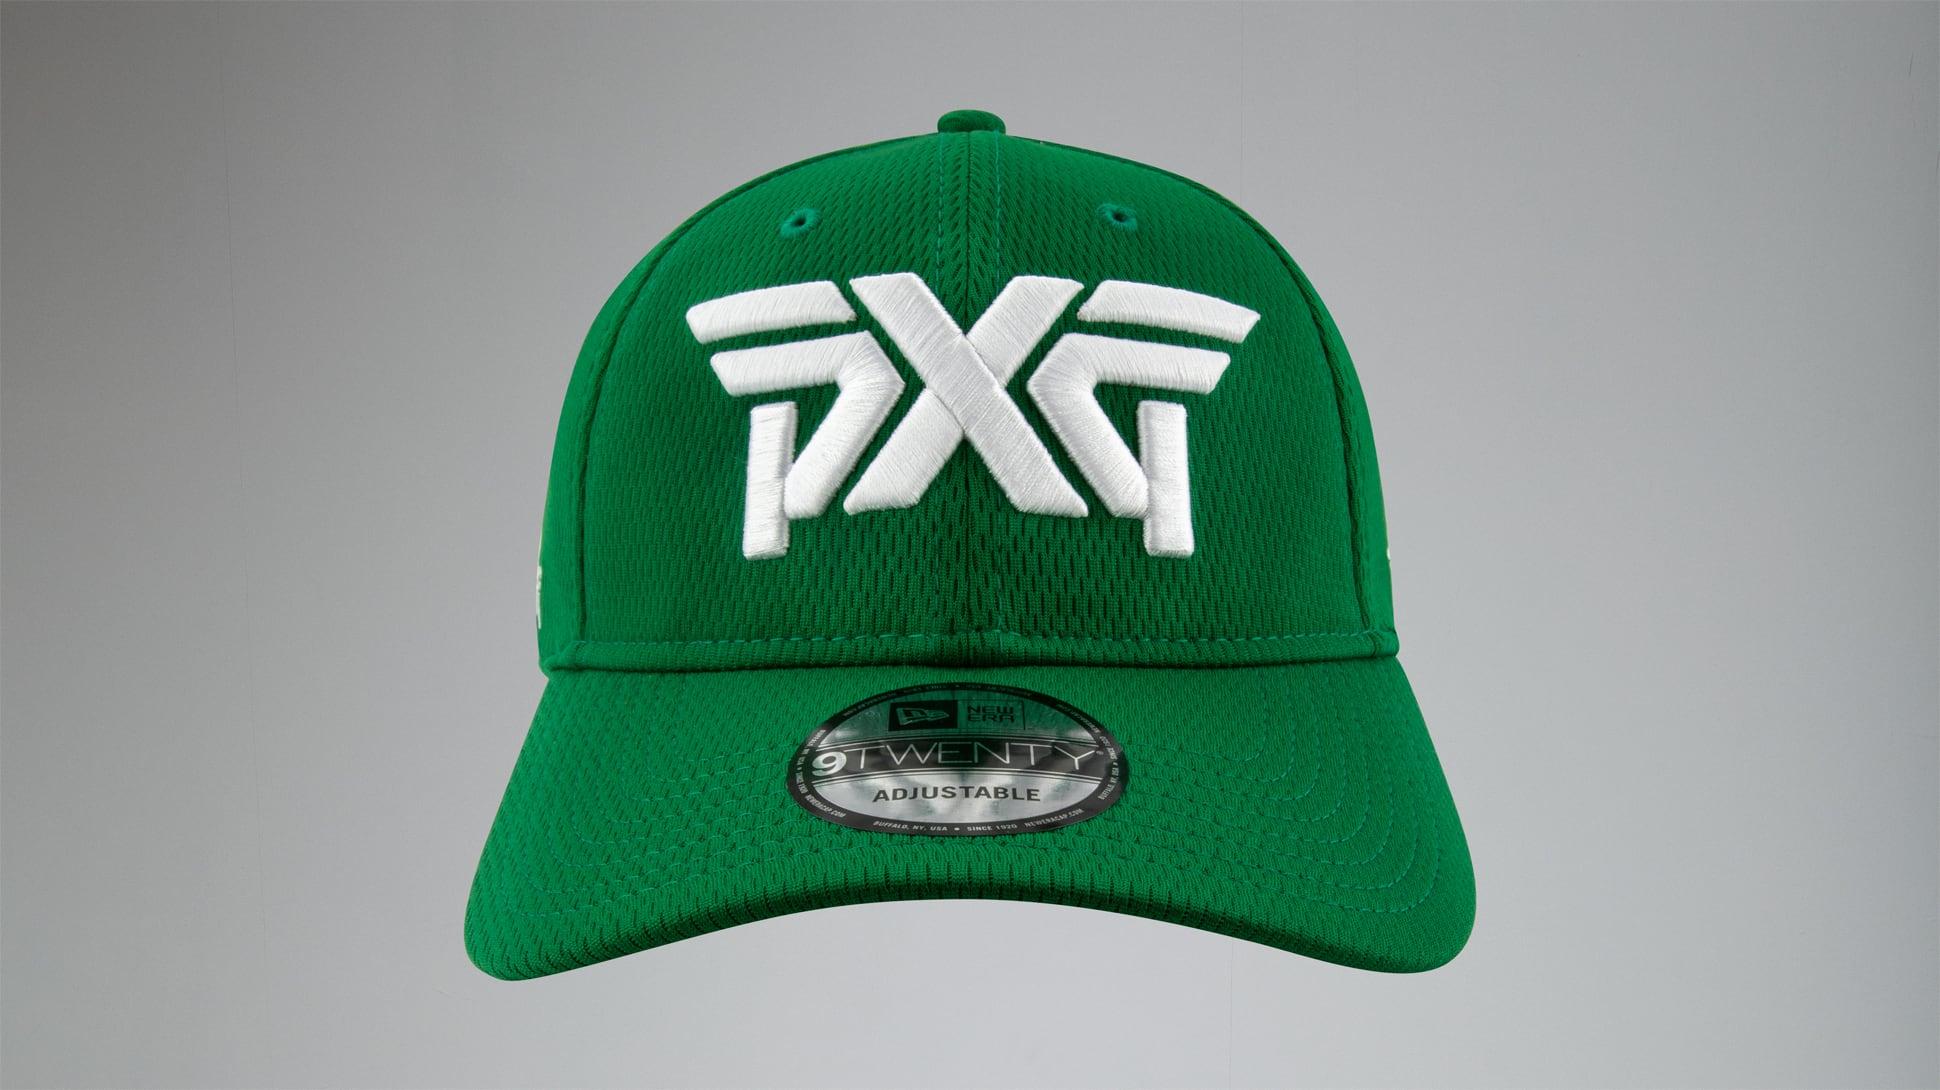 Georgia Green 9TWENTY Adjustable Cap Image 2